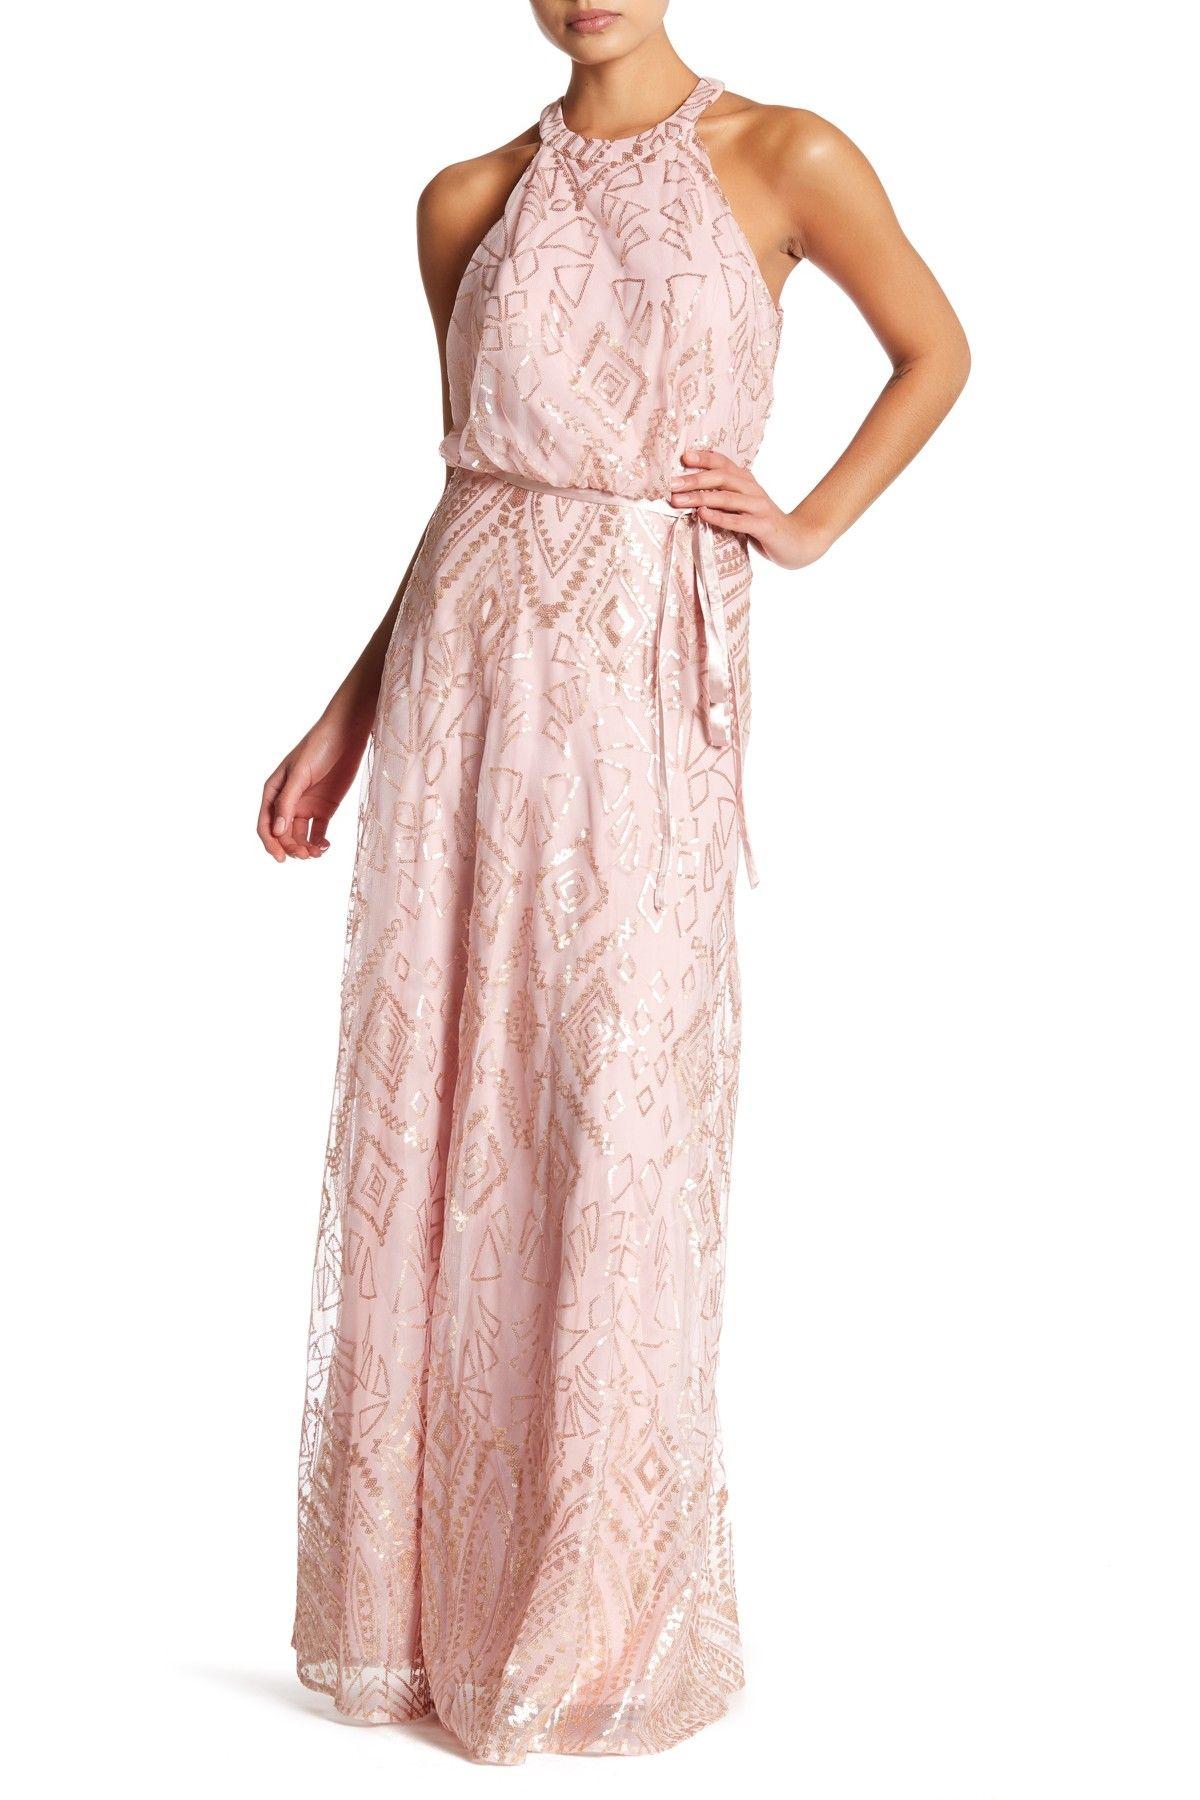 Nordstrom dresses wedding guest  High Neck Ribbon Sash Long Dress by Marina on nordstromrack